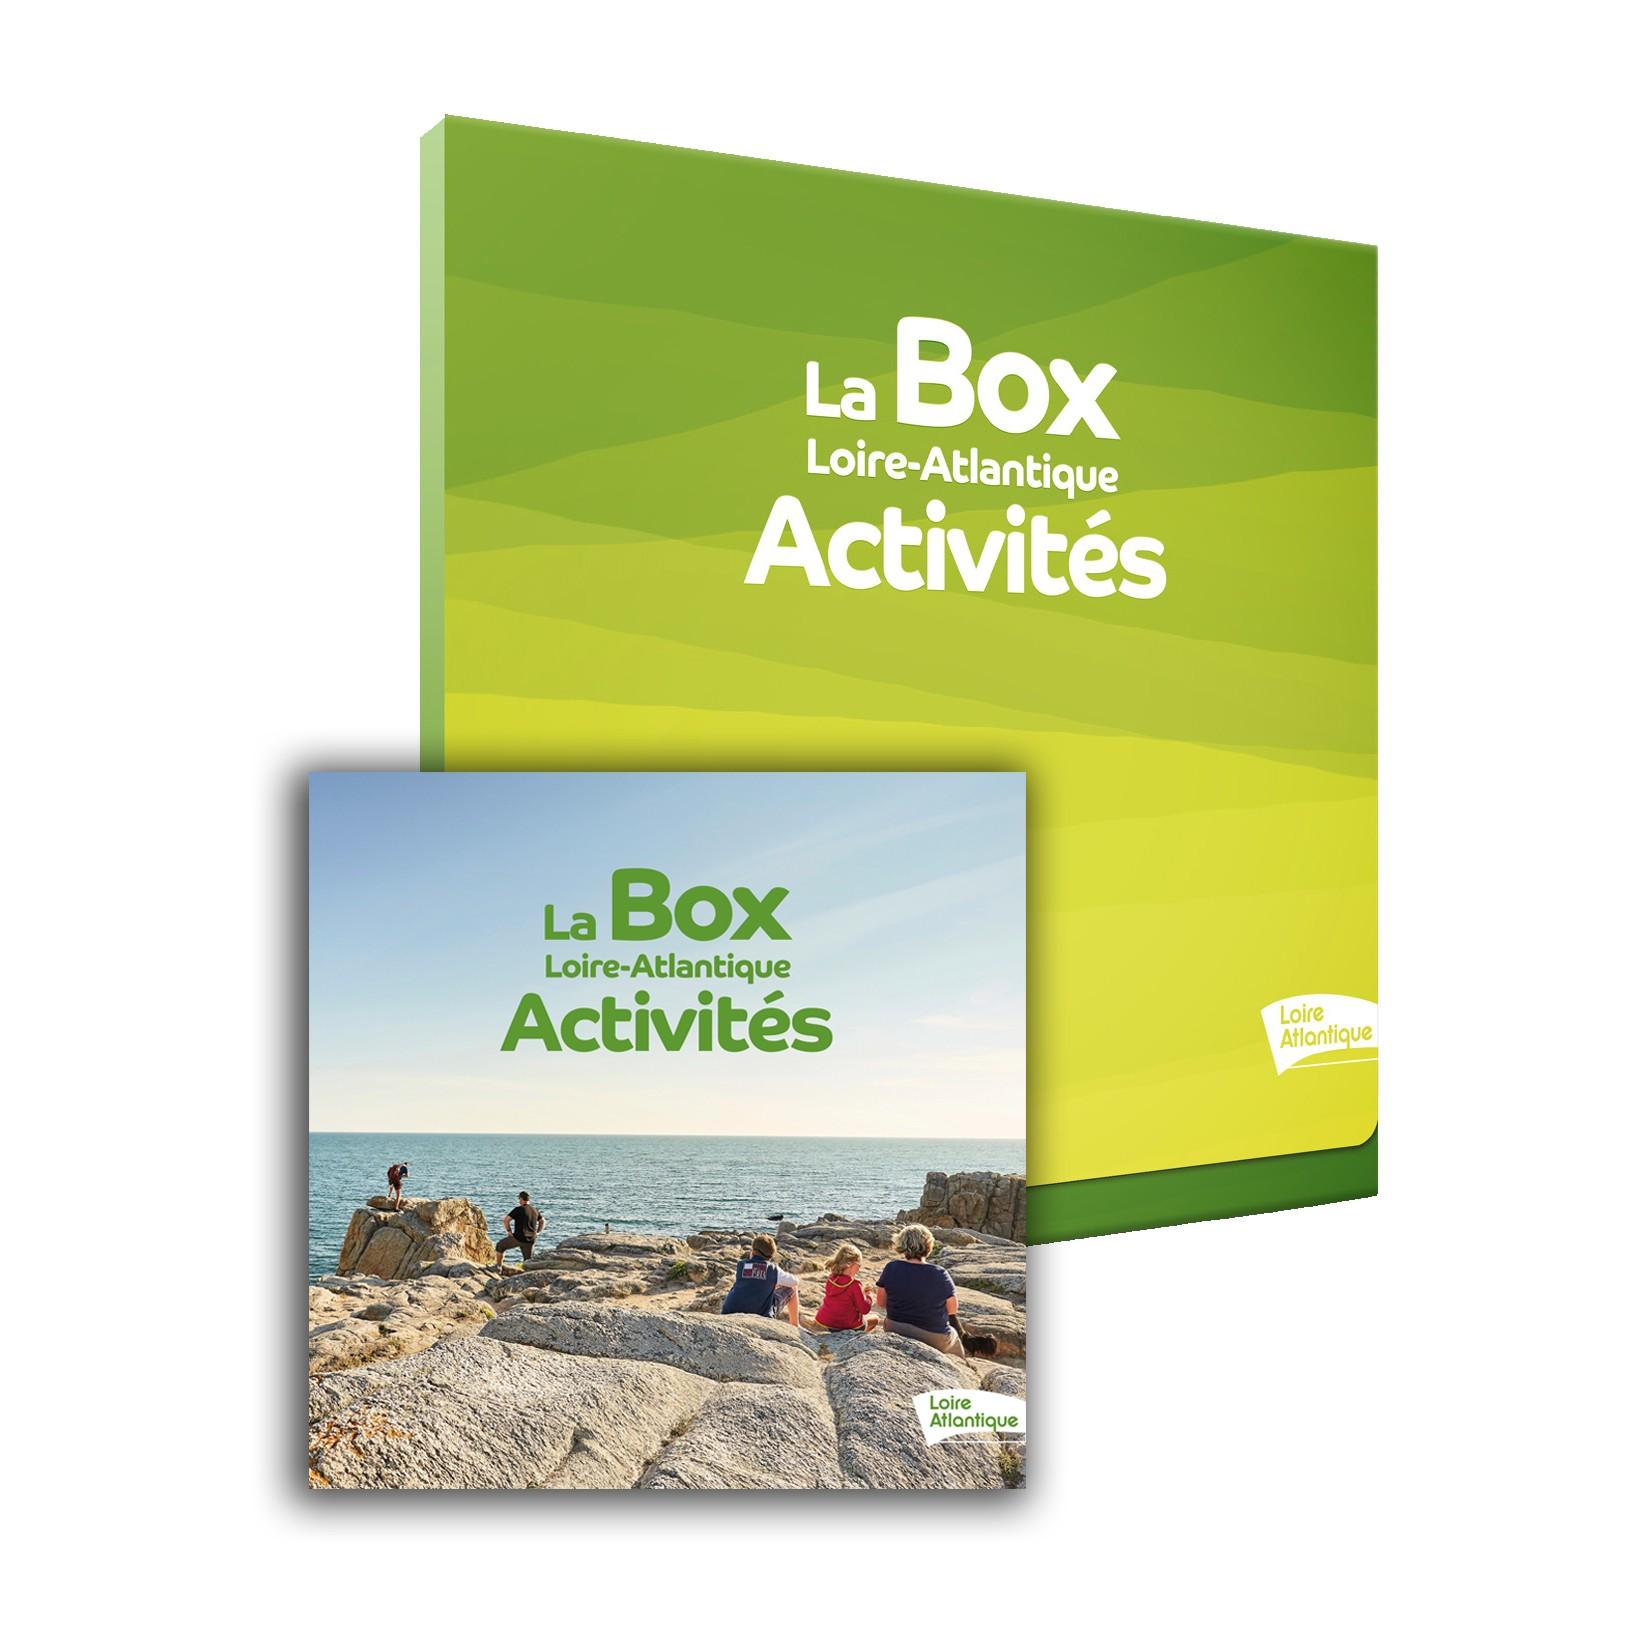 box-2018-pre-sentation-coffret-activite-s-2200